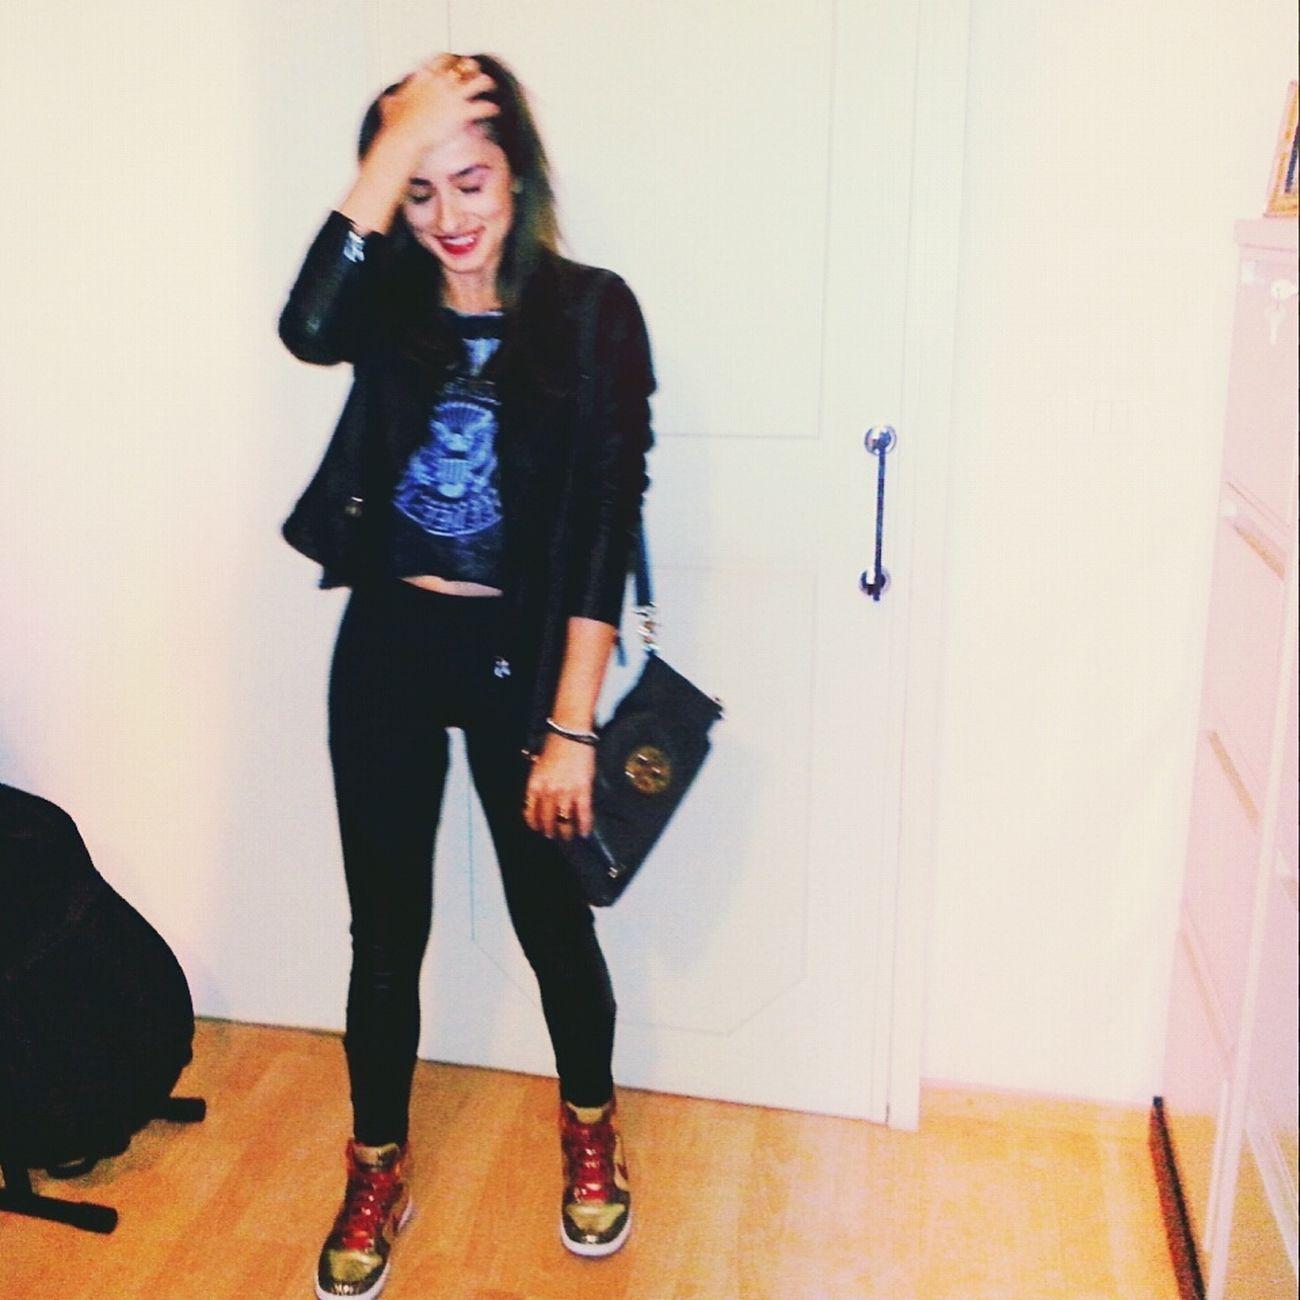 In black clothes we trust Amen Ootd Today's Hot Look